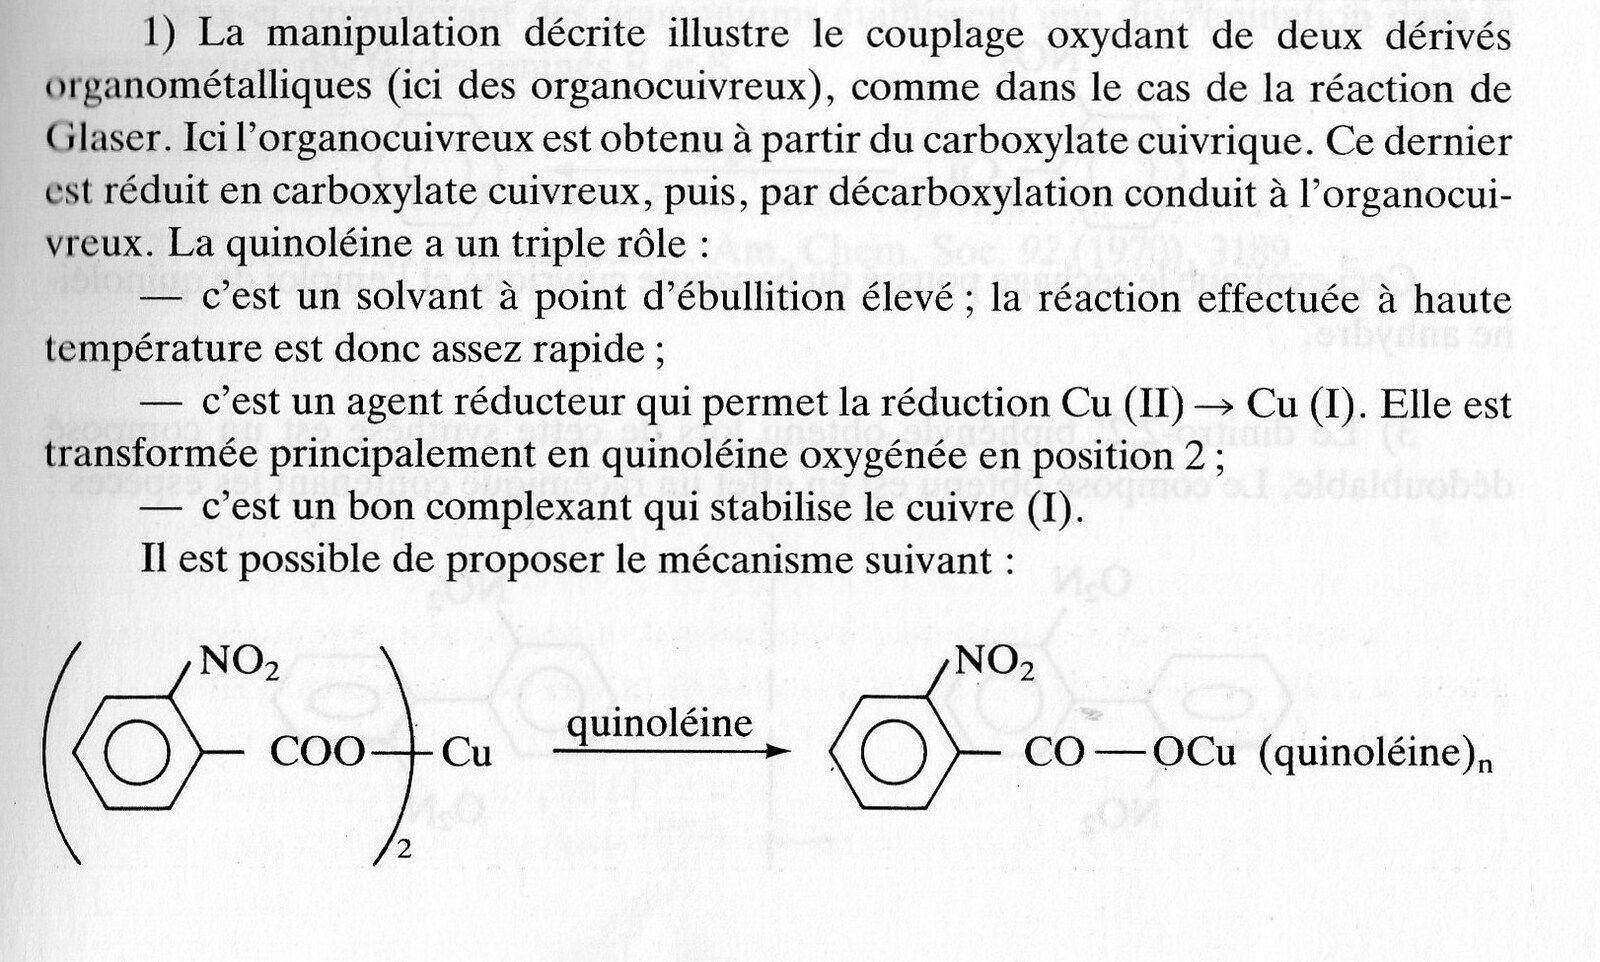 218 - synthèse du 2,2'-dinitrobiphényle (méthode de Schambach)